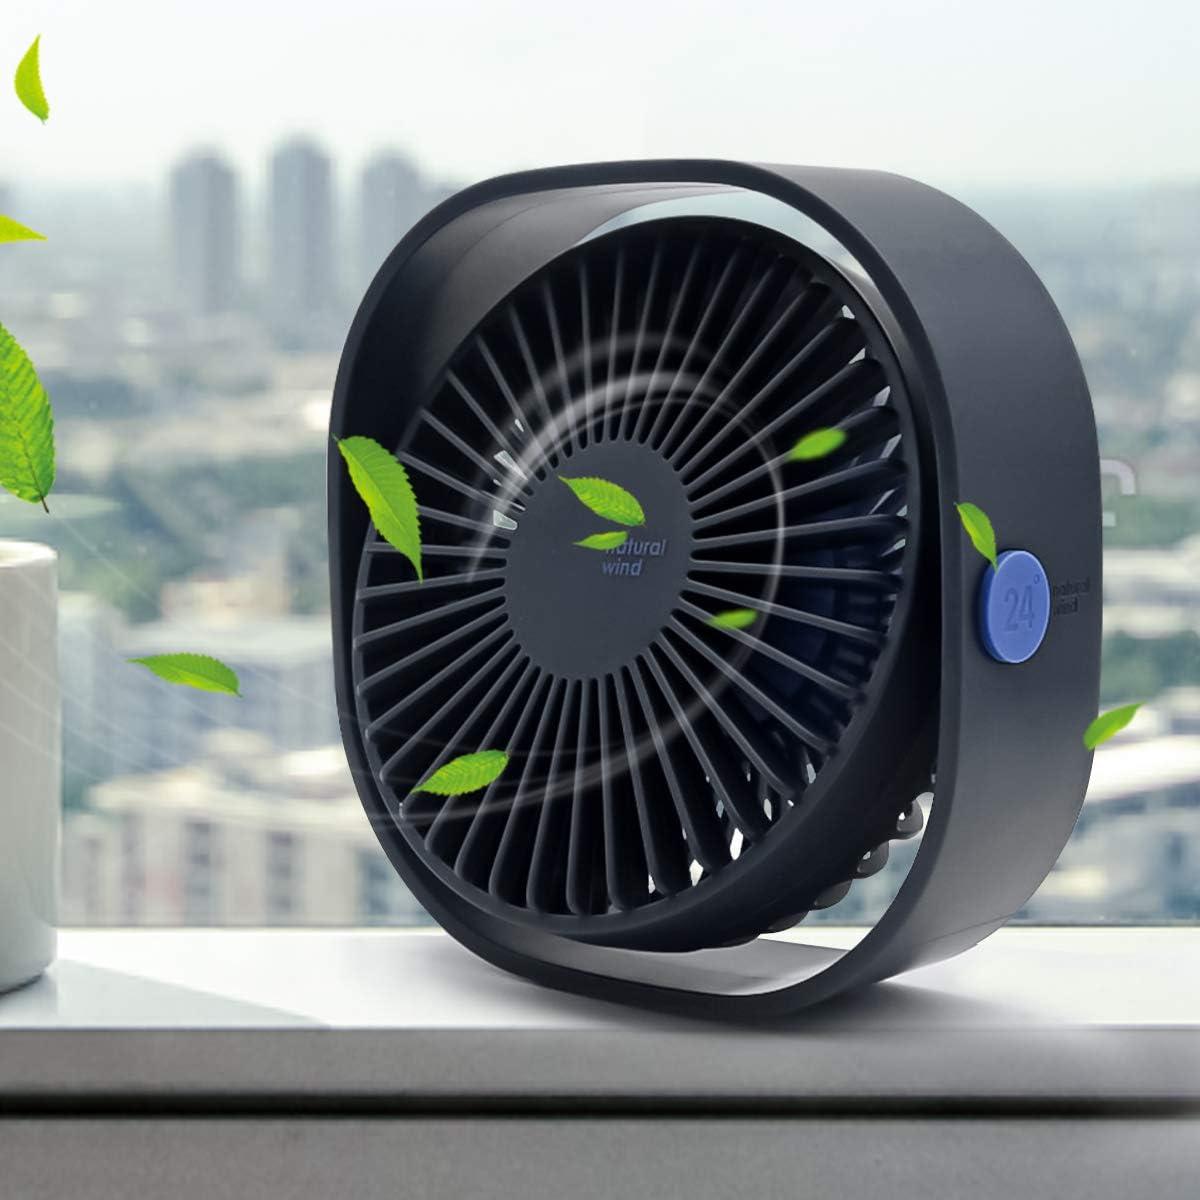 Mini USB Desk Fan, 3 Speed Personal Small Desktop Table Quiet USB Fan for Home Office Car Outdoor Travel (Blue)